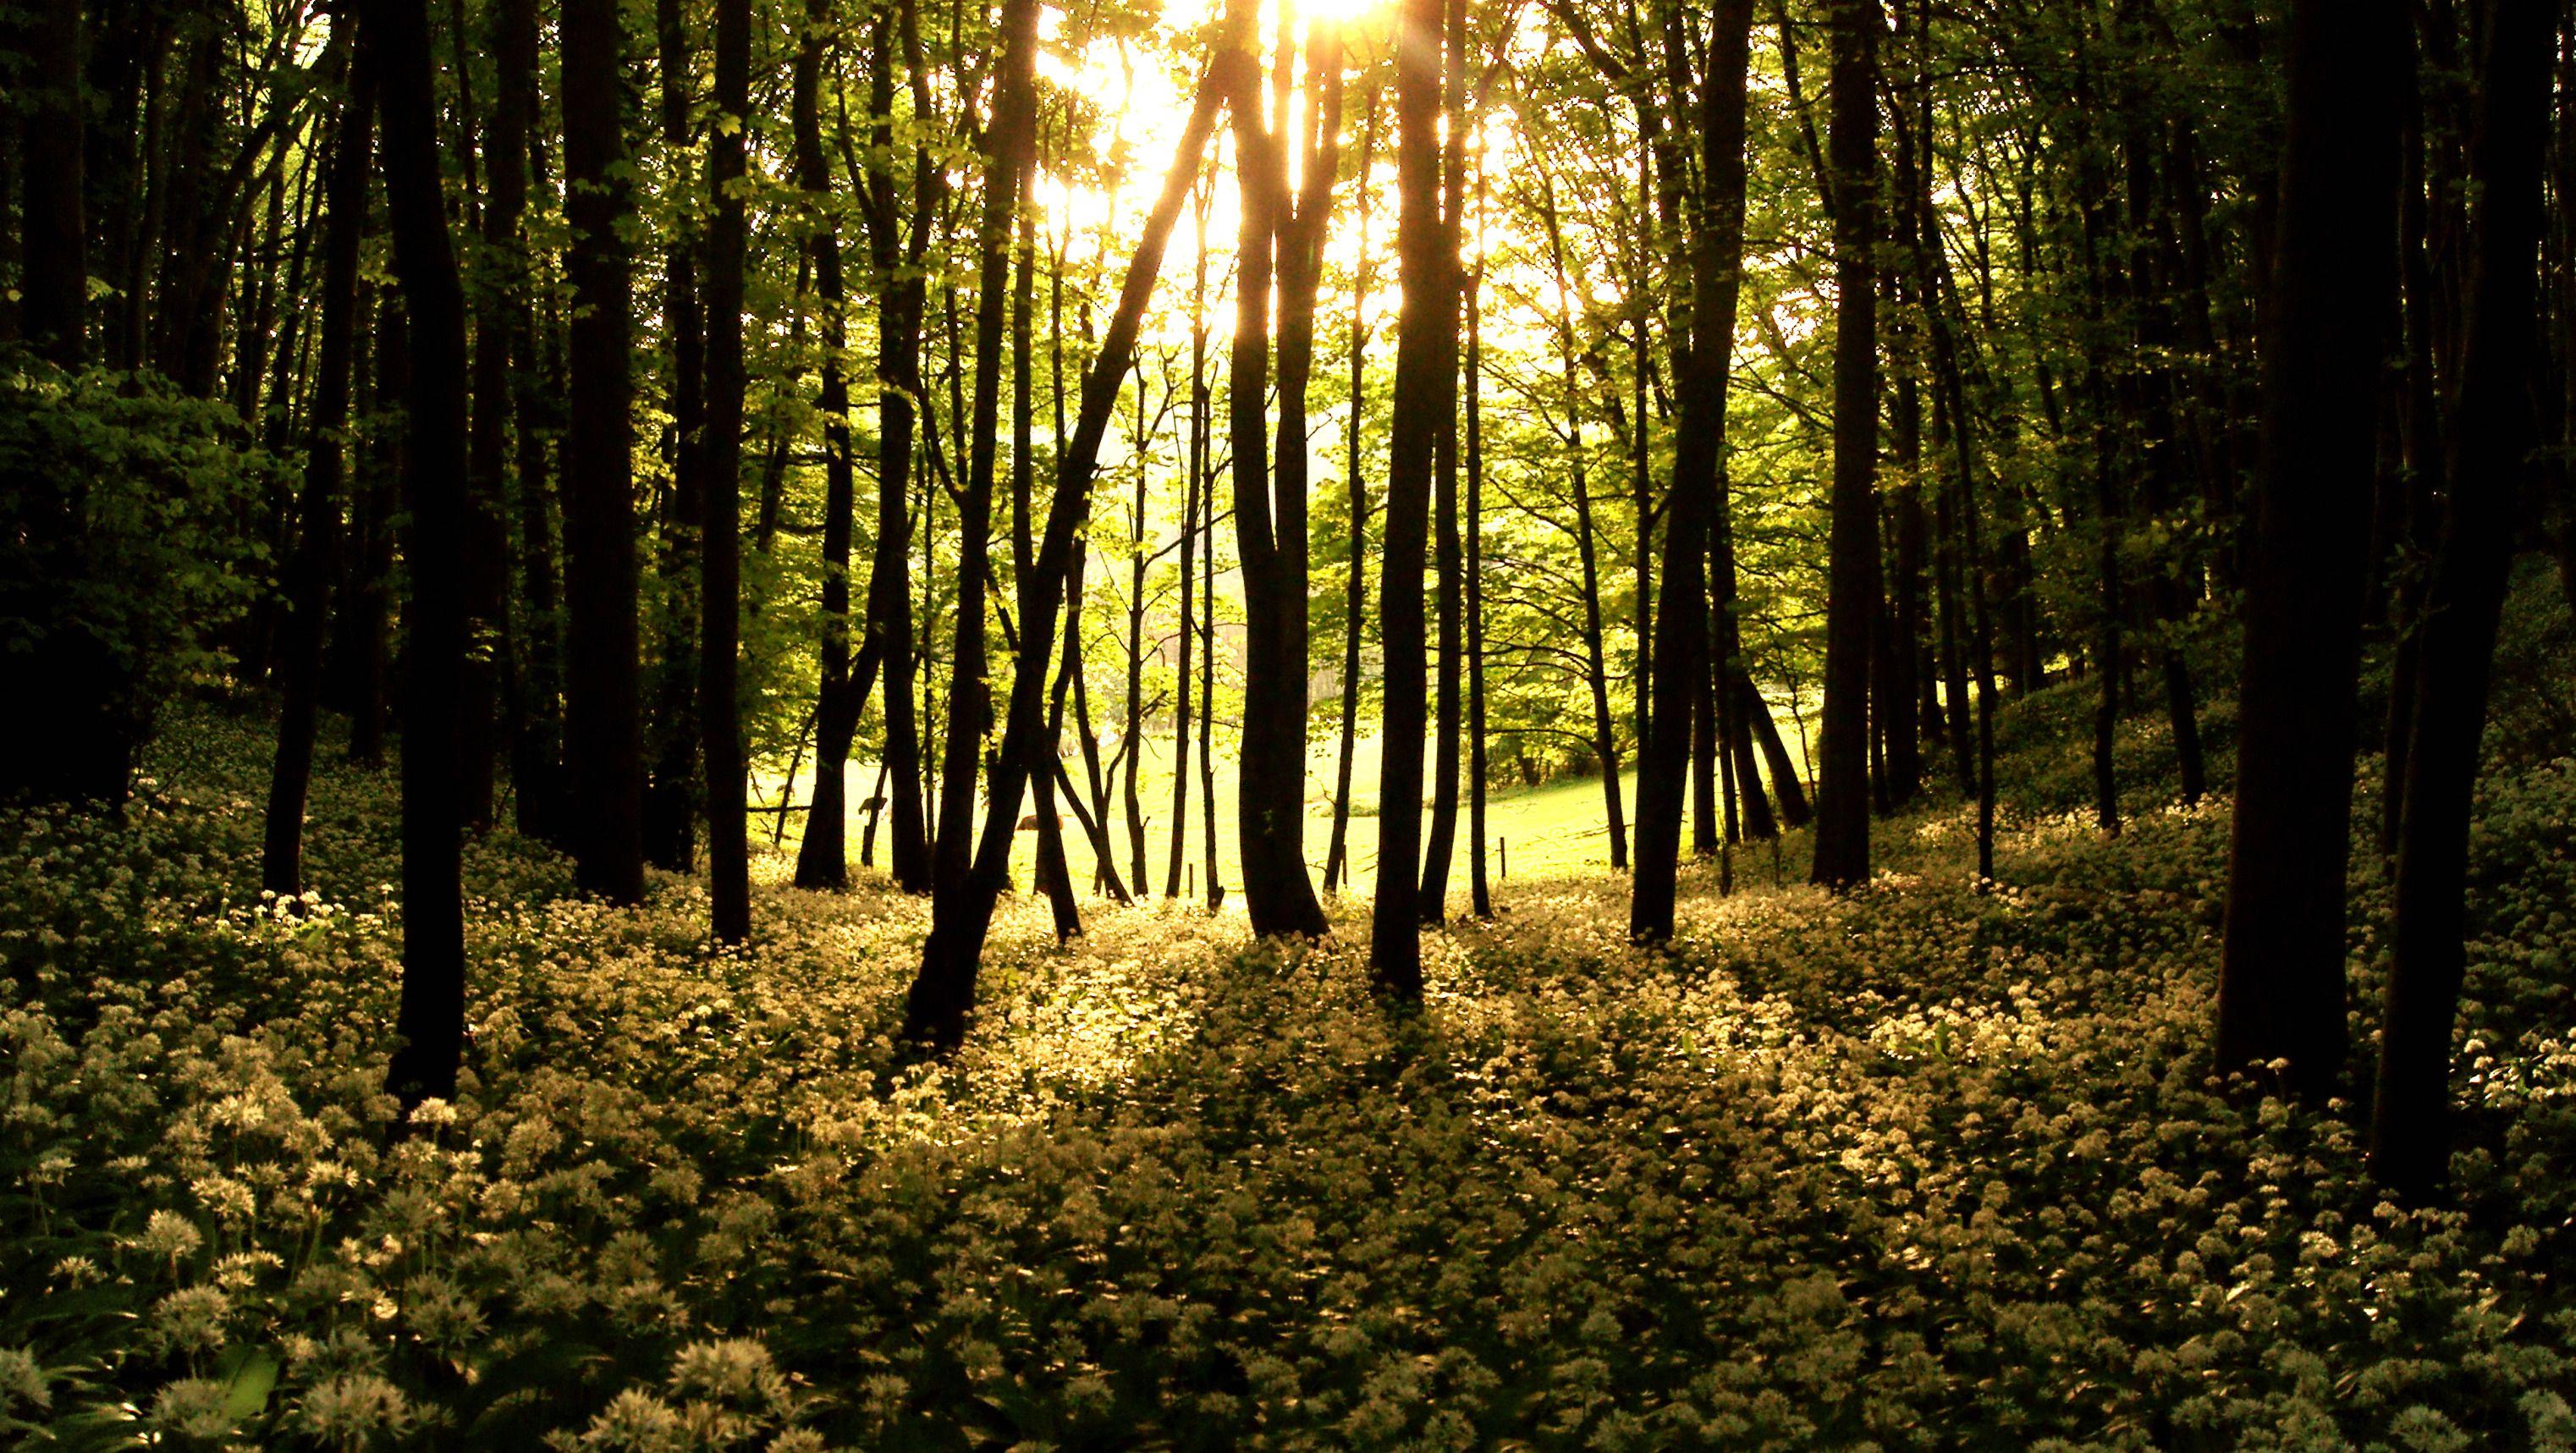 Haikus From The Woods By Whiteplumfragrance On Deviantart